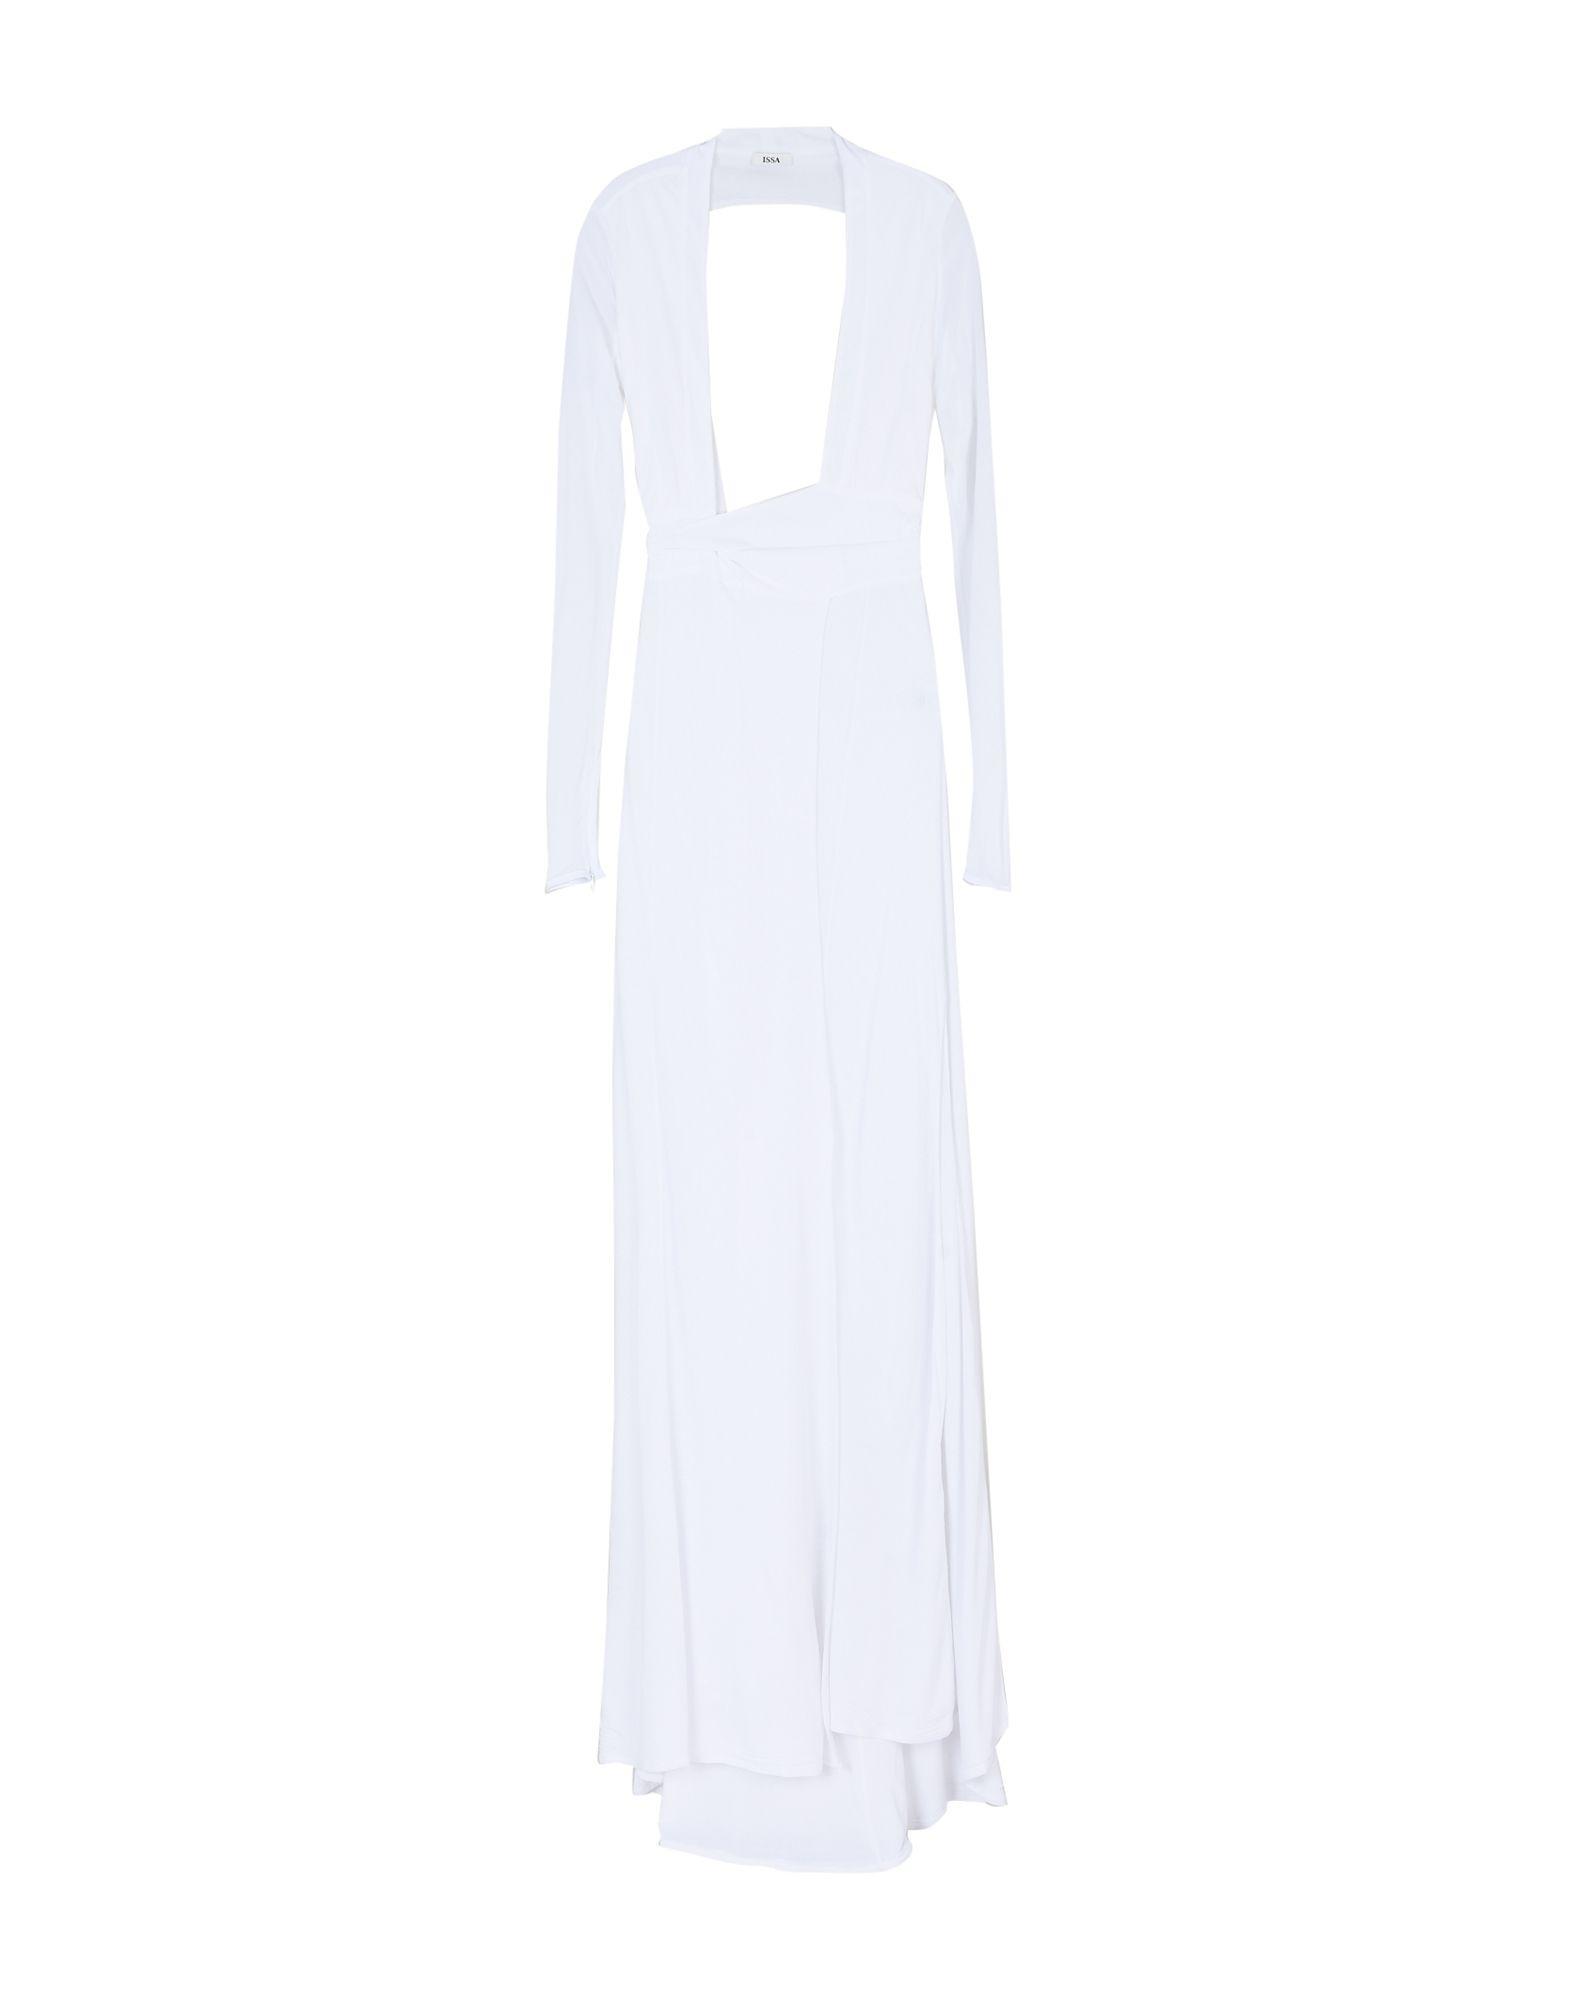 Issa Long Dress In White